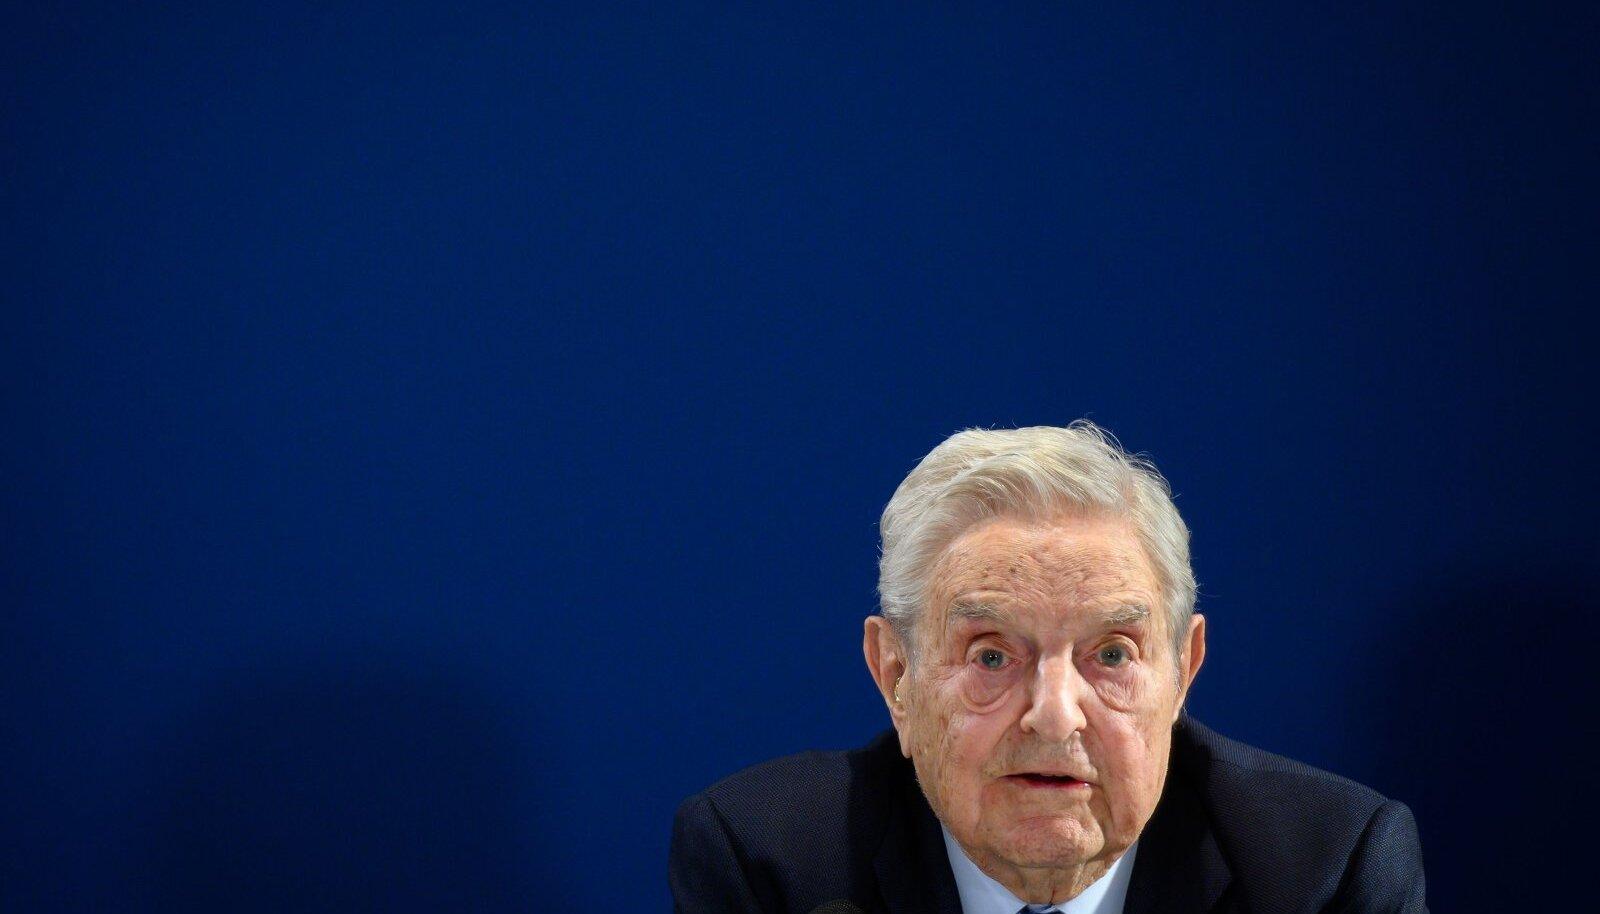 Spekulant ja filantroop George Soros